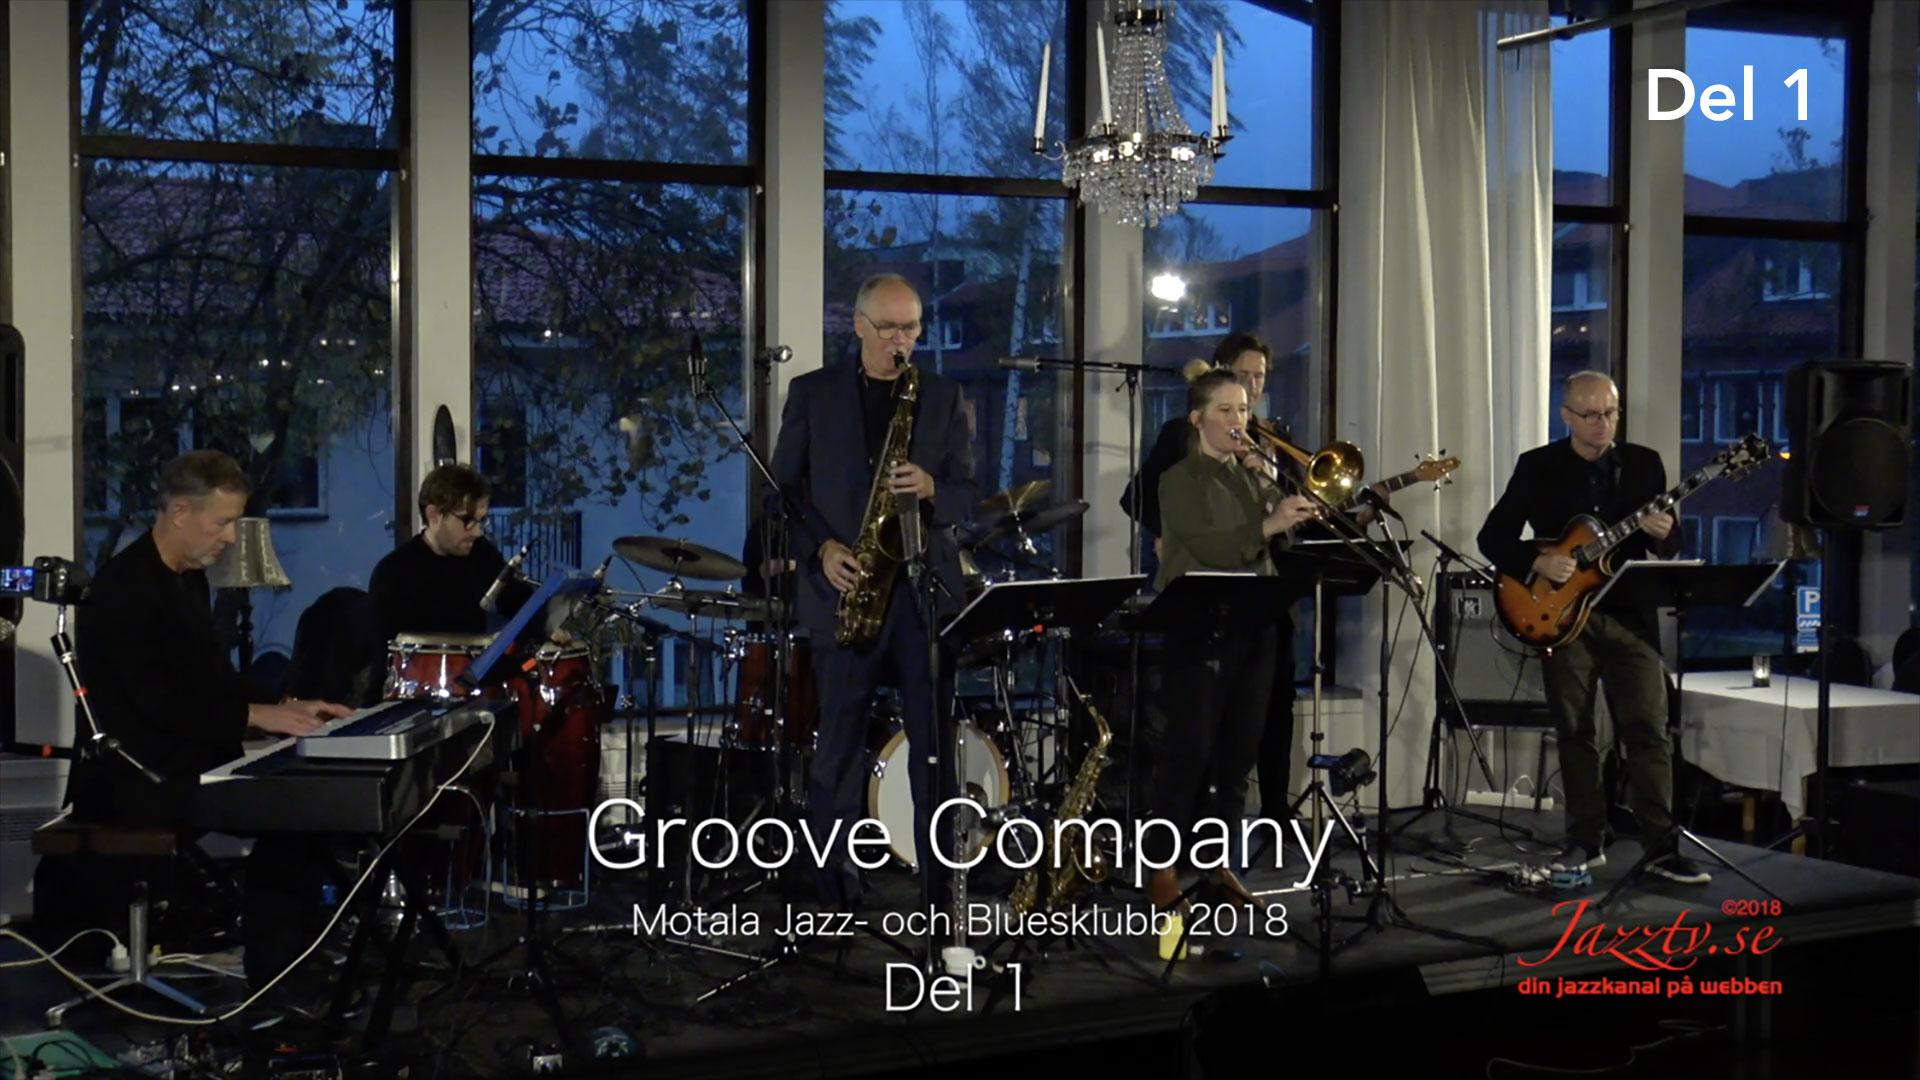 Groove Company